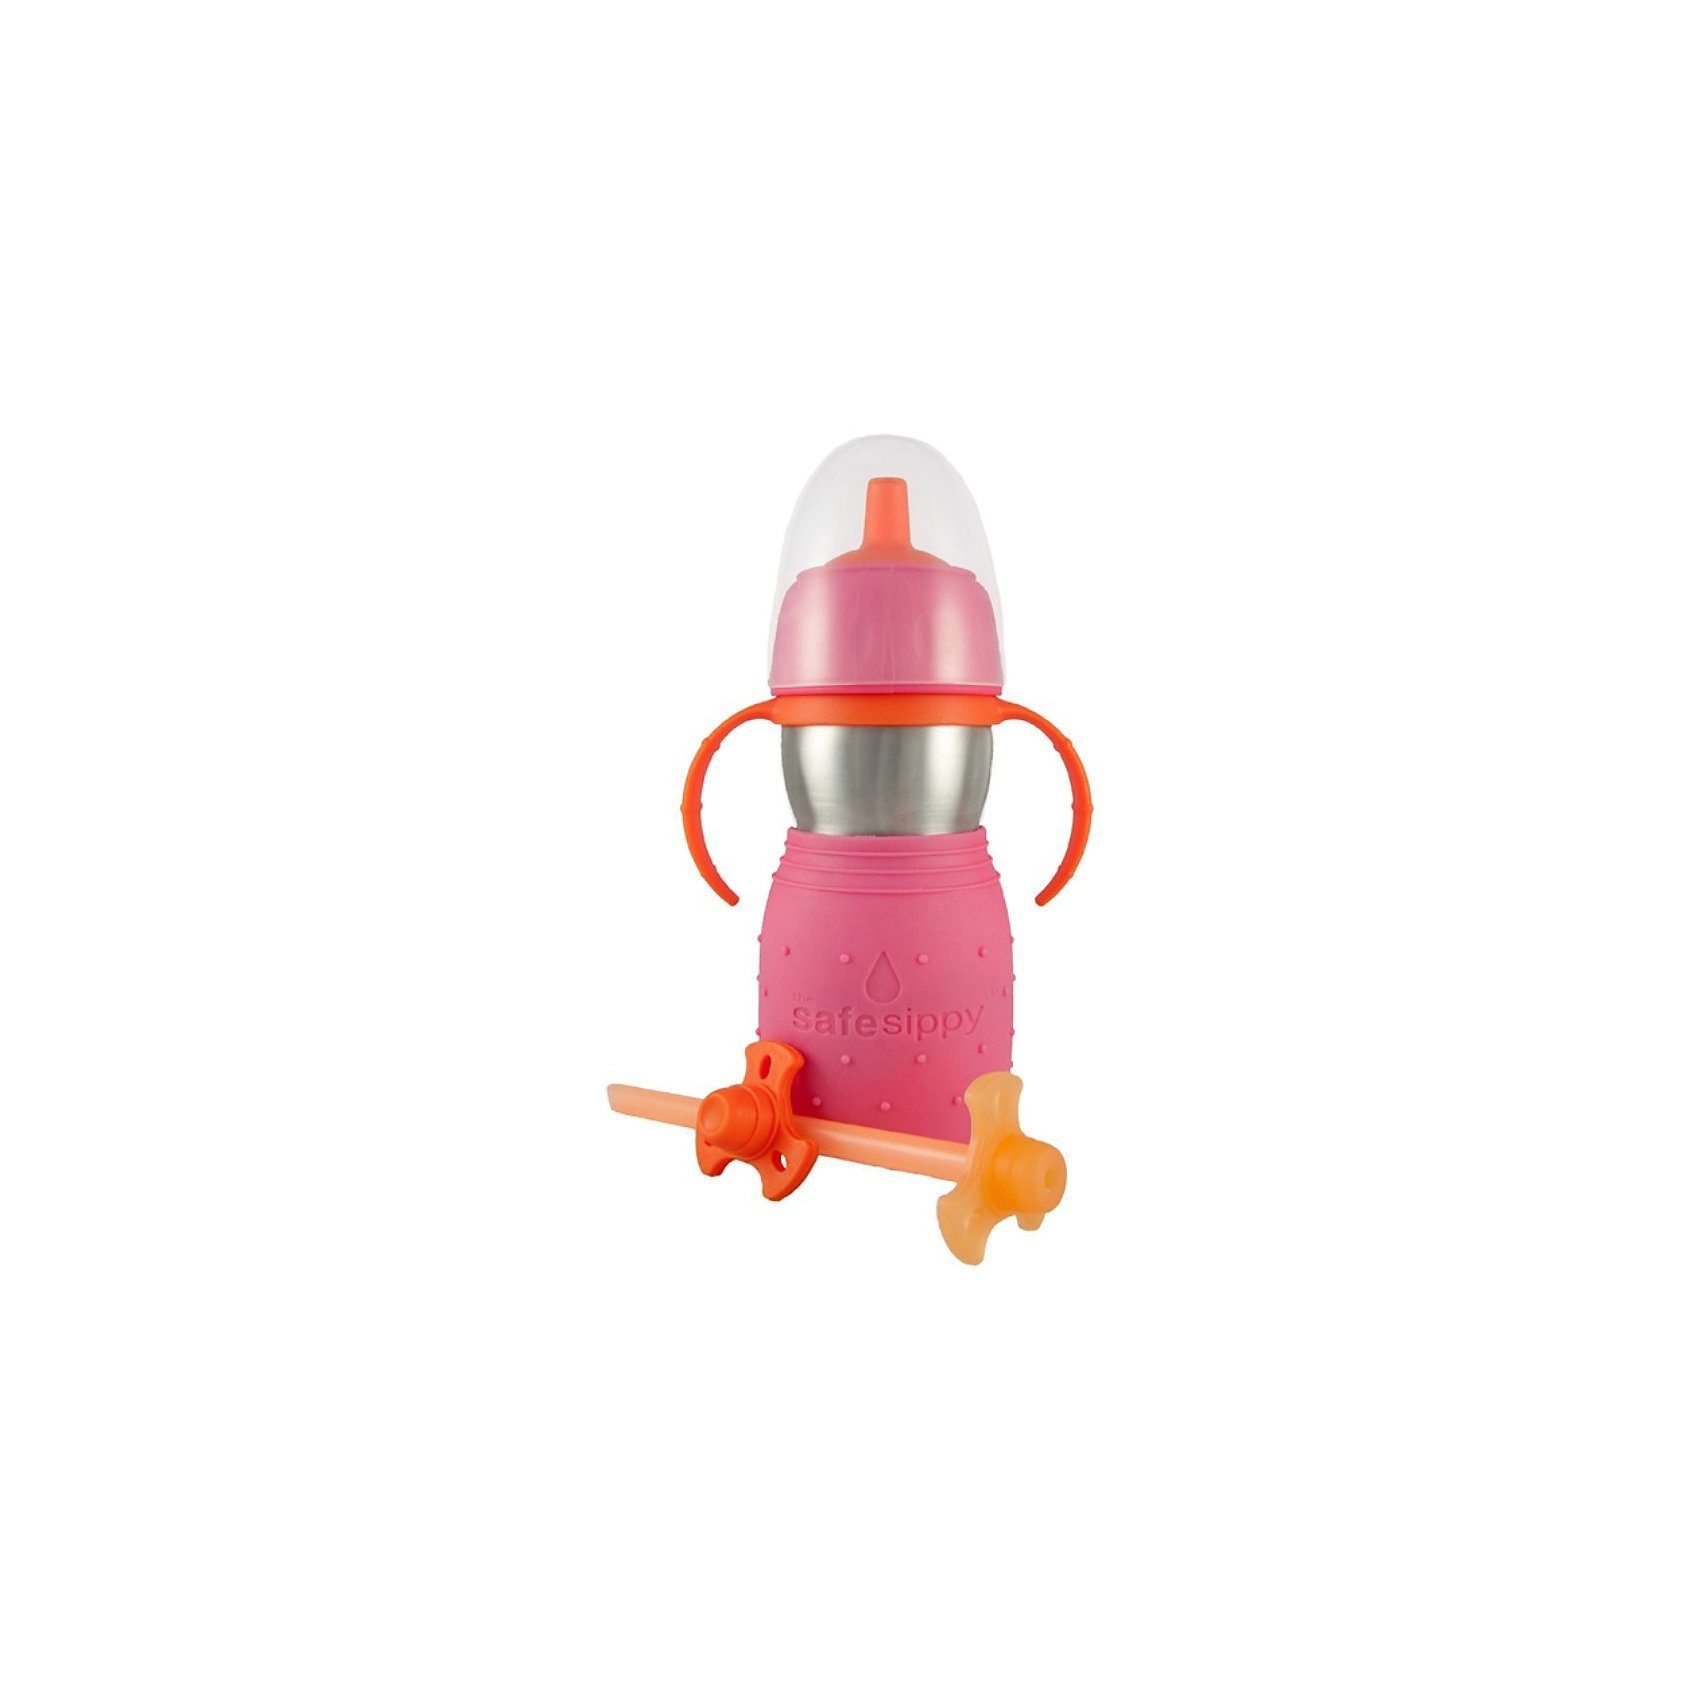 Kid Basix Safe Sippy Trinkflasche, 330 ml